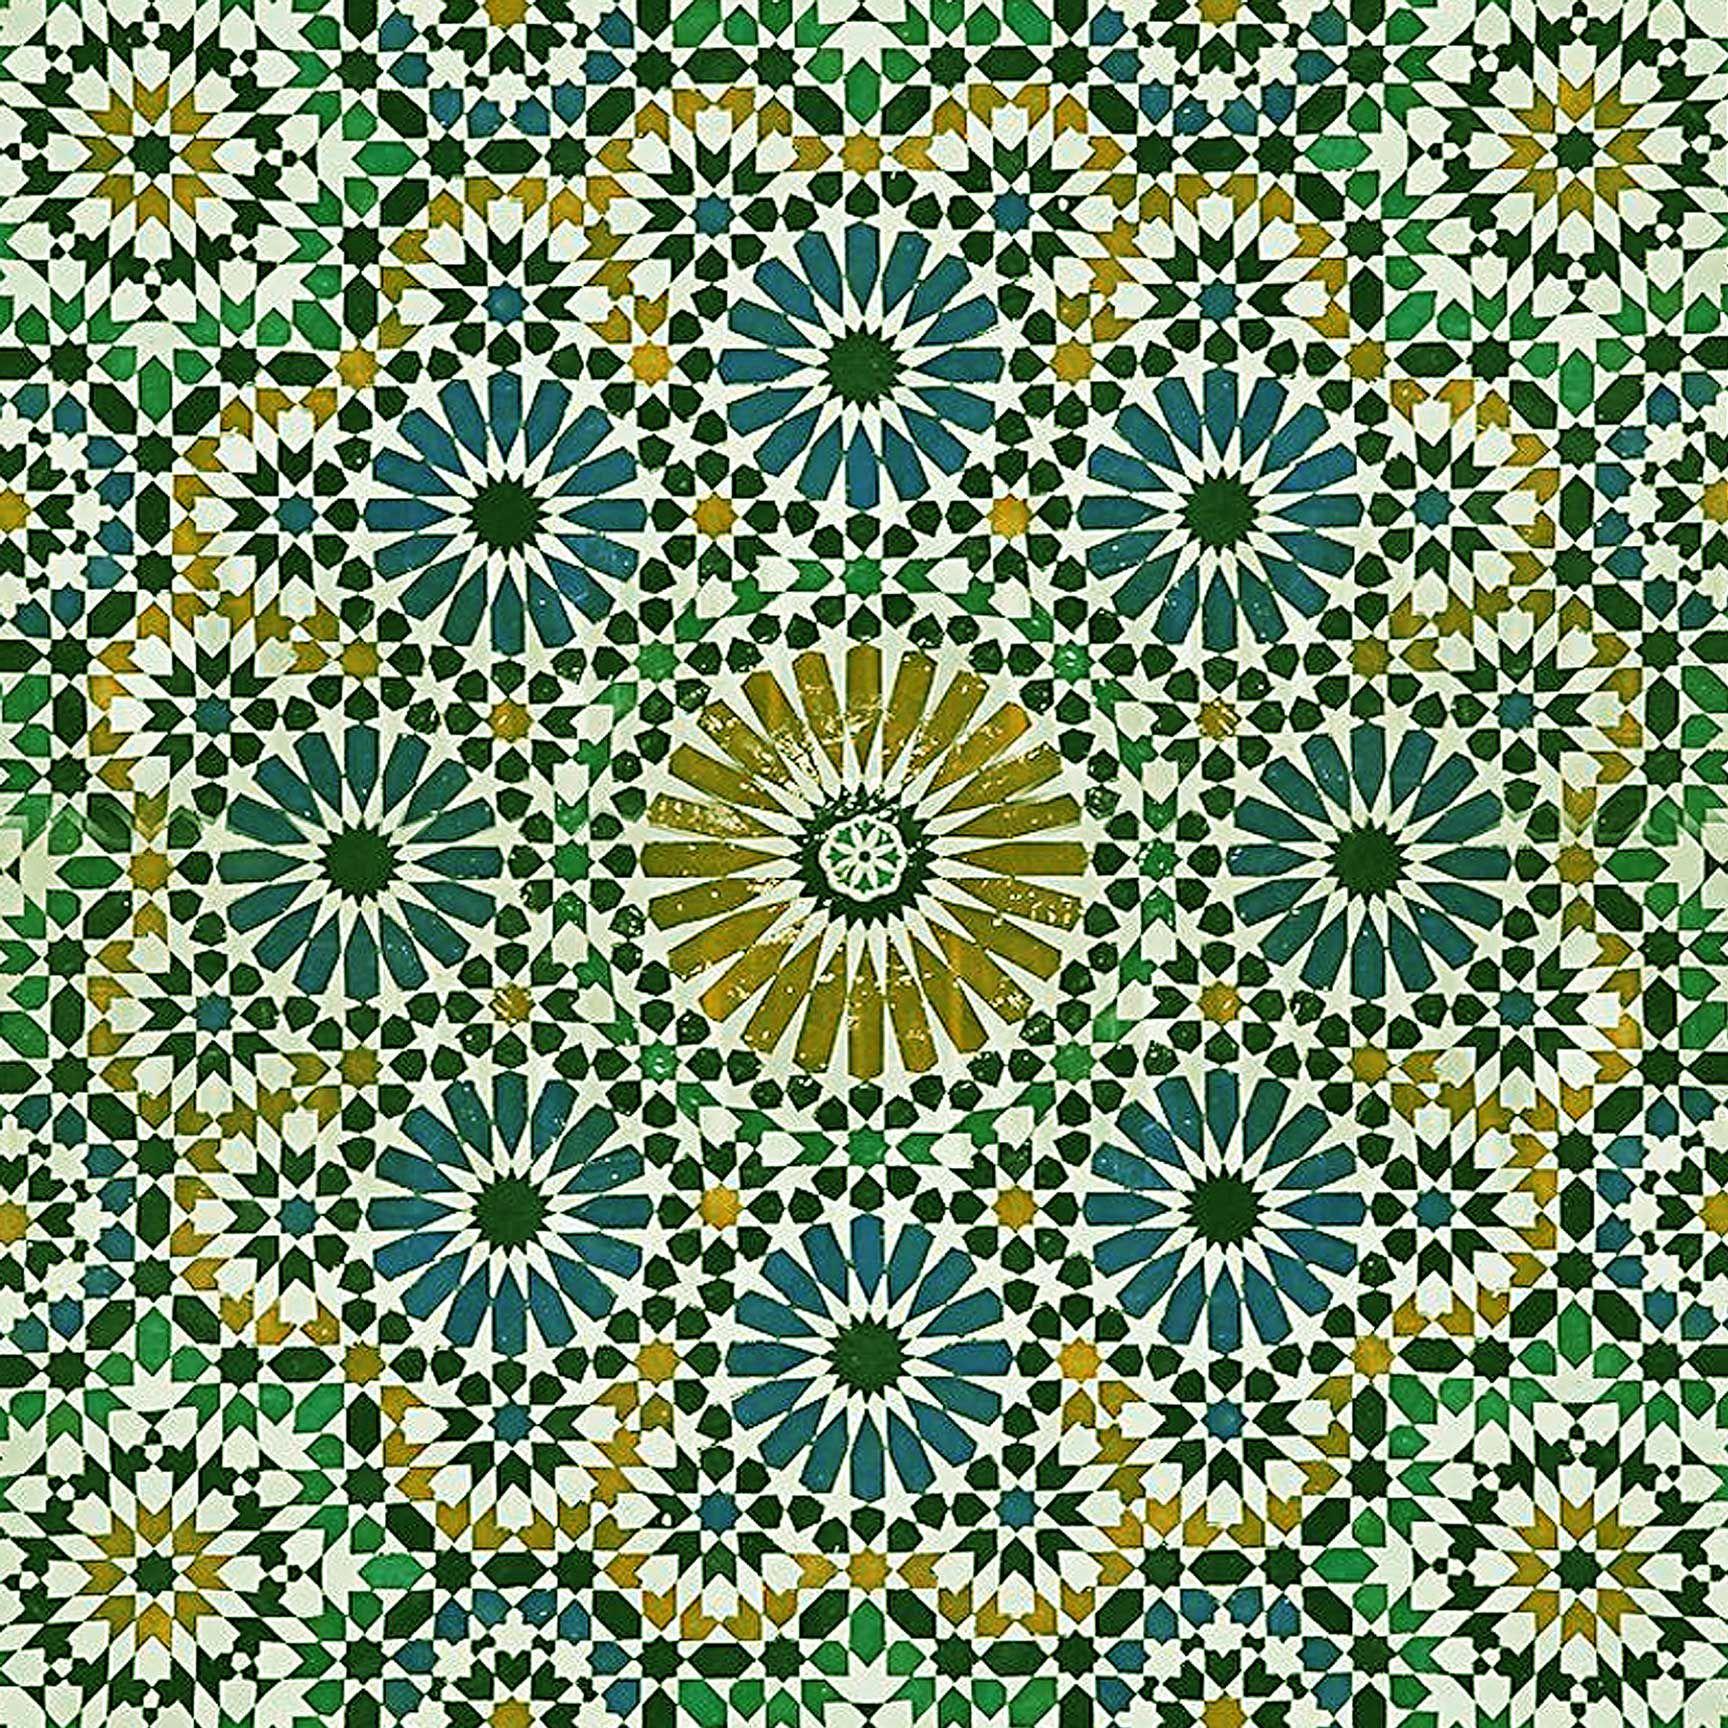 Morocco mosaic ceiling tile pinterest ceiling tiles morocco mosaic ceiling tile dailygadgetfo Choice Image